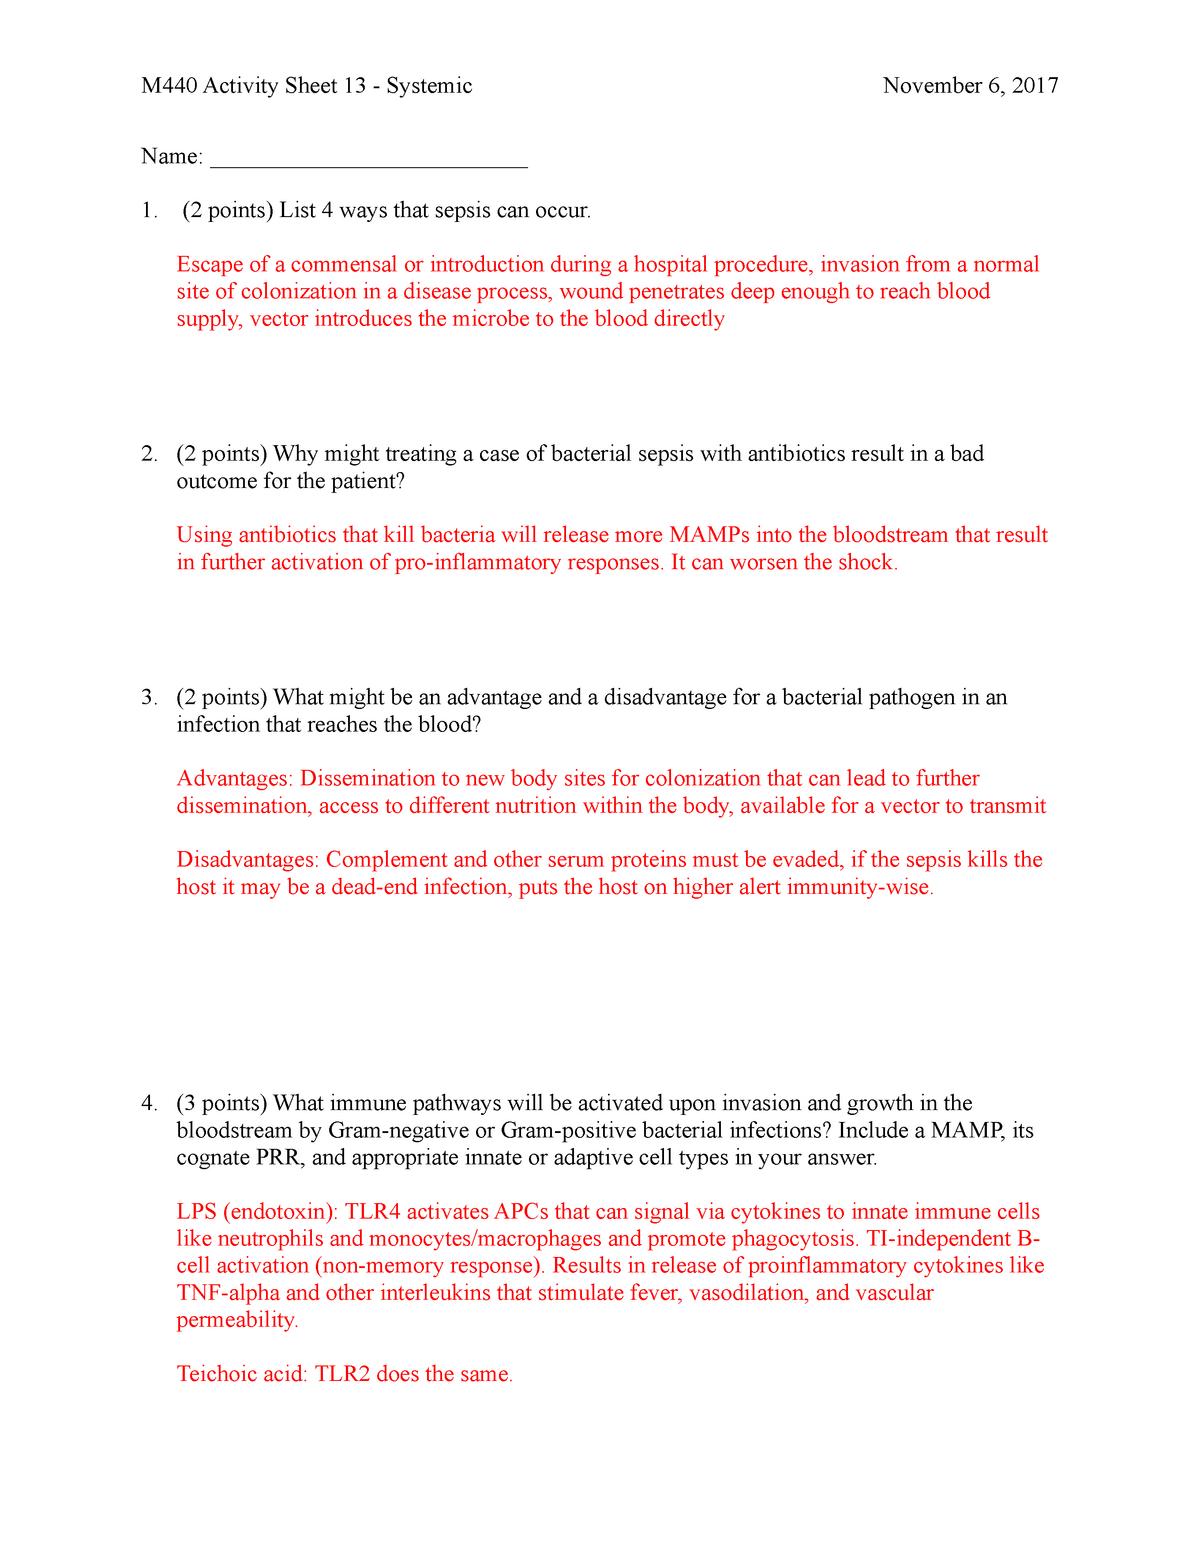 13 Systemic - KEY - Lecture notes 13 - BIOL-M 440 - StuDocu